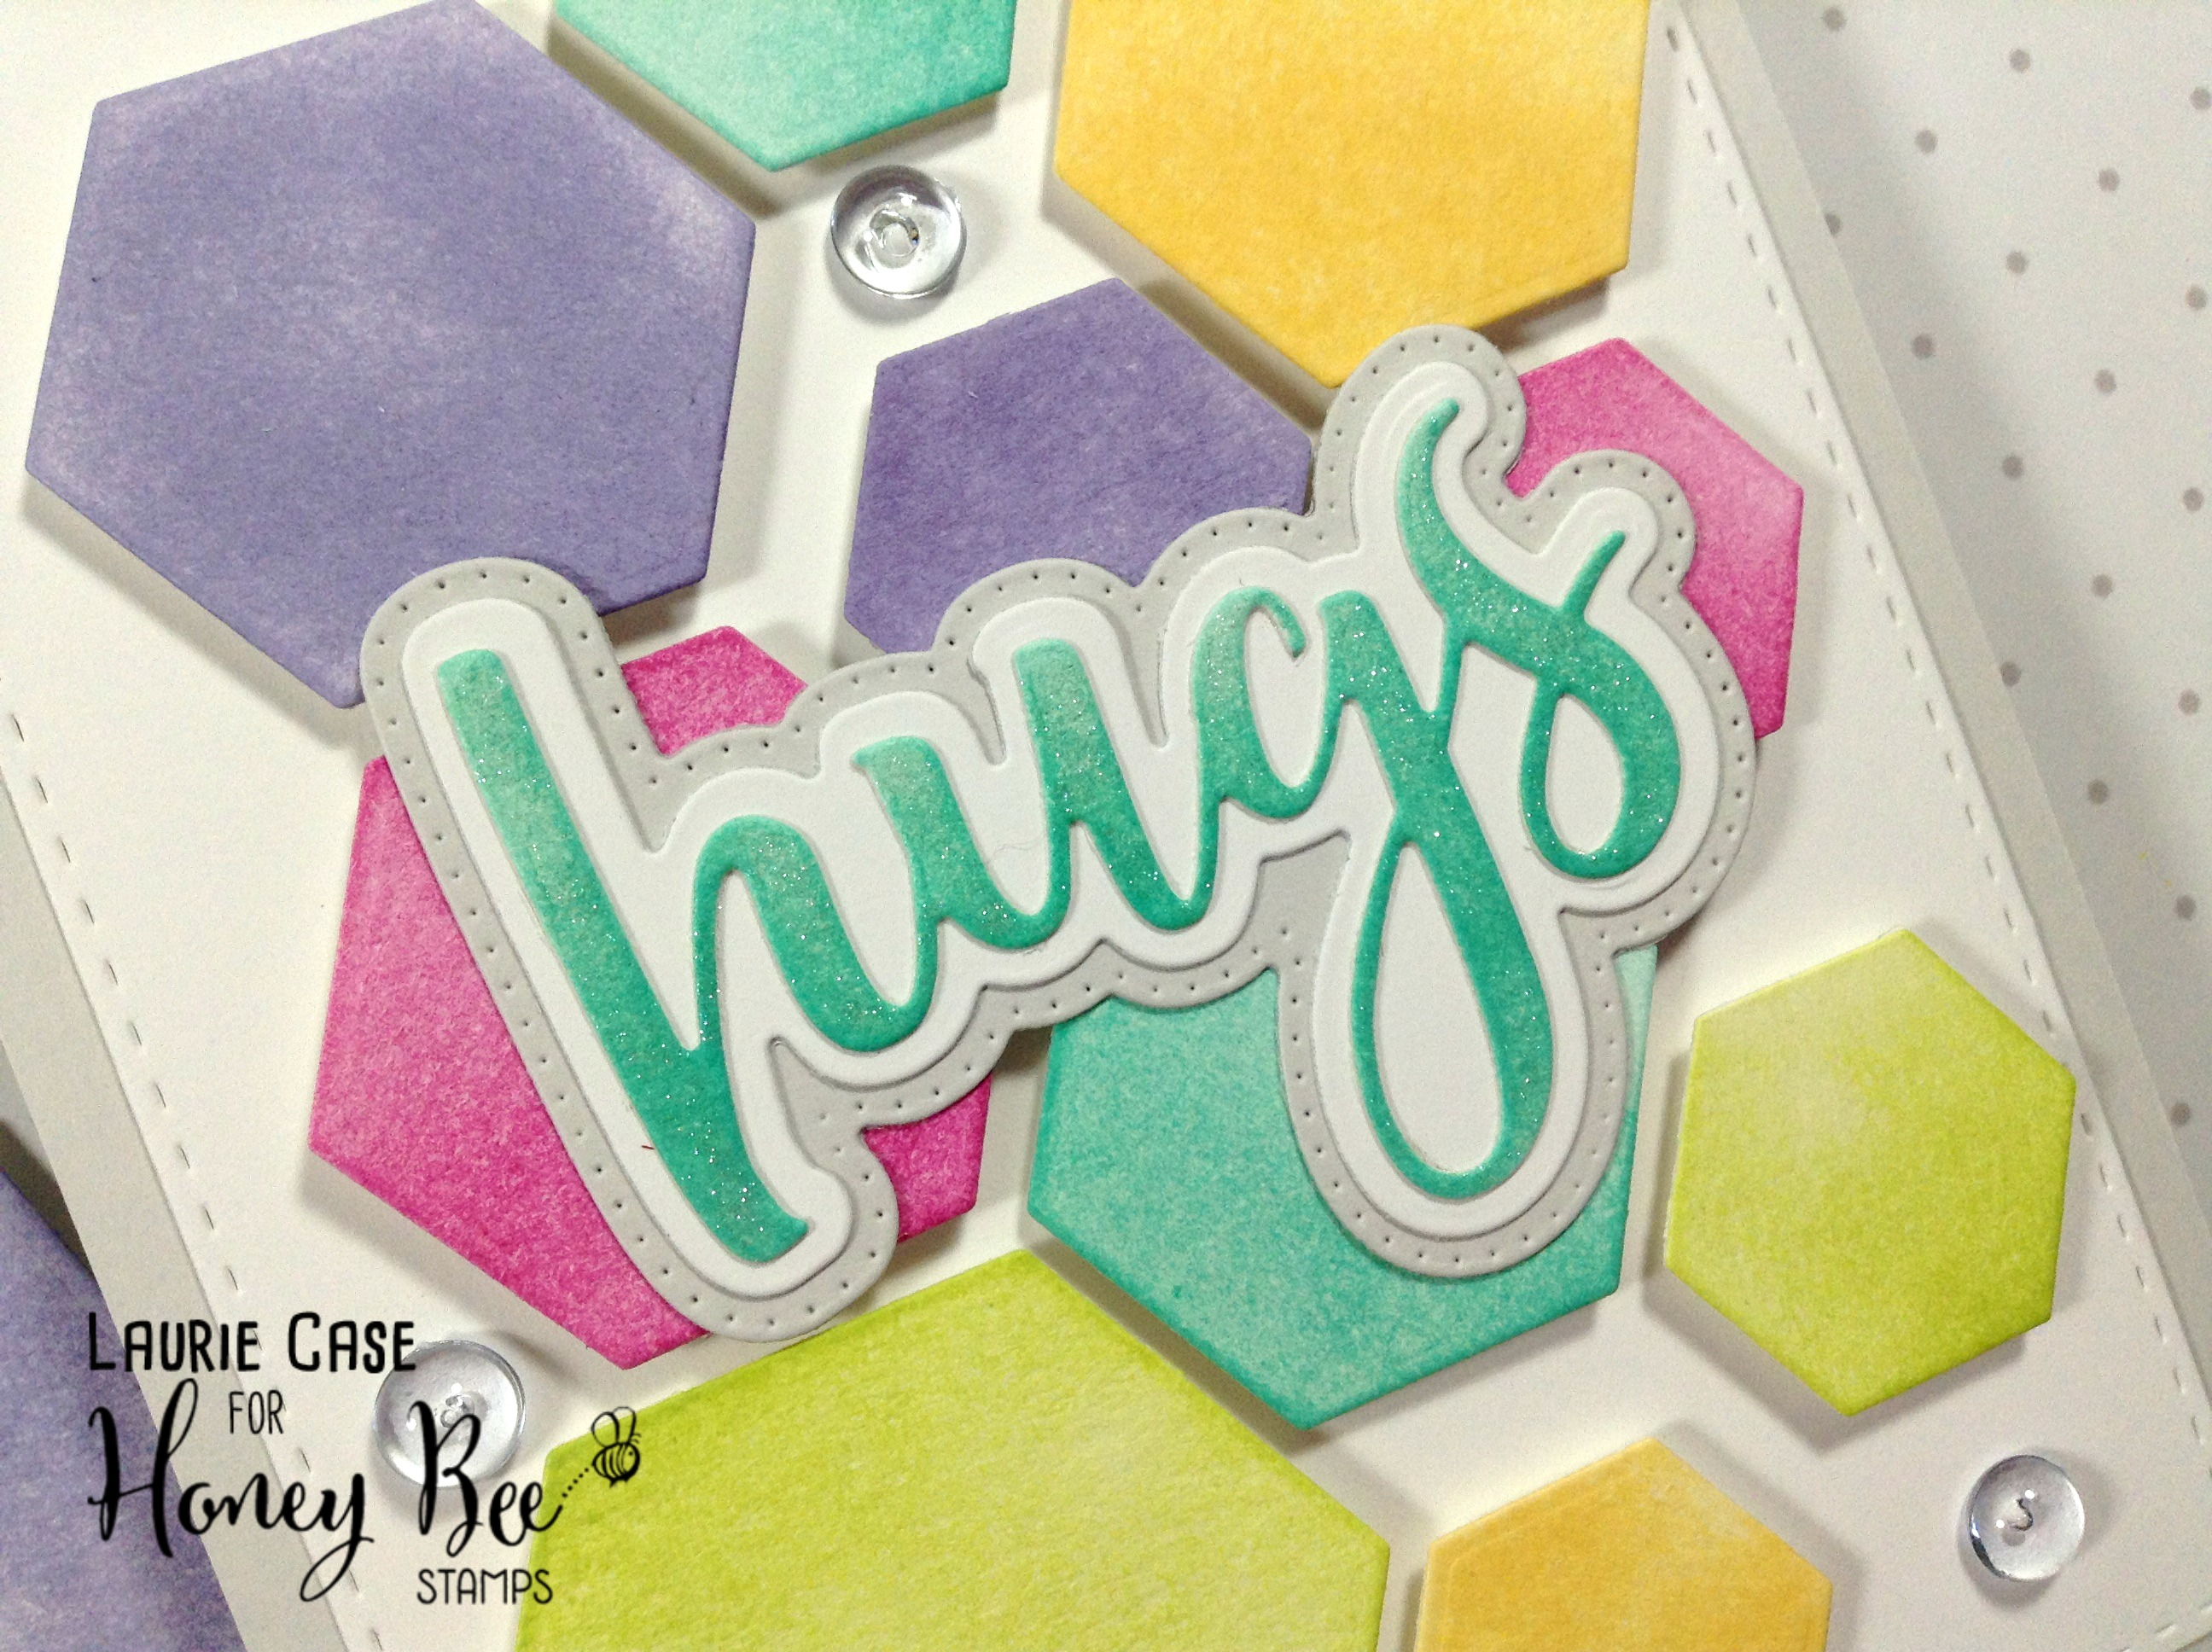 Hexagon Hugs!